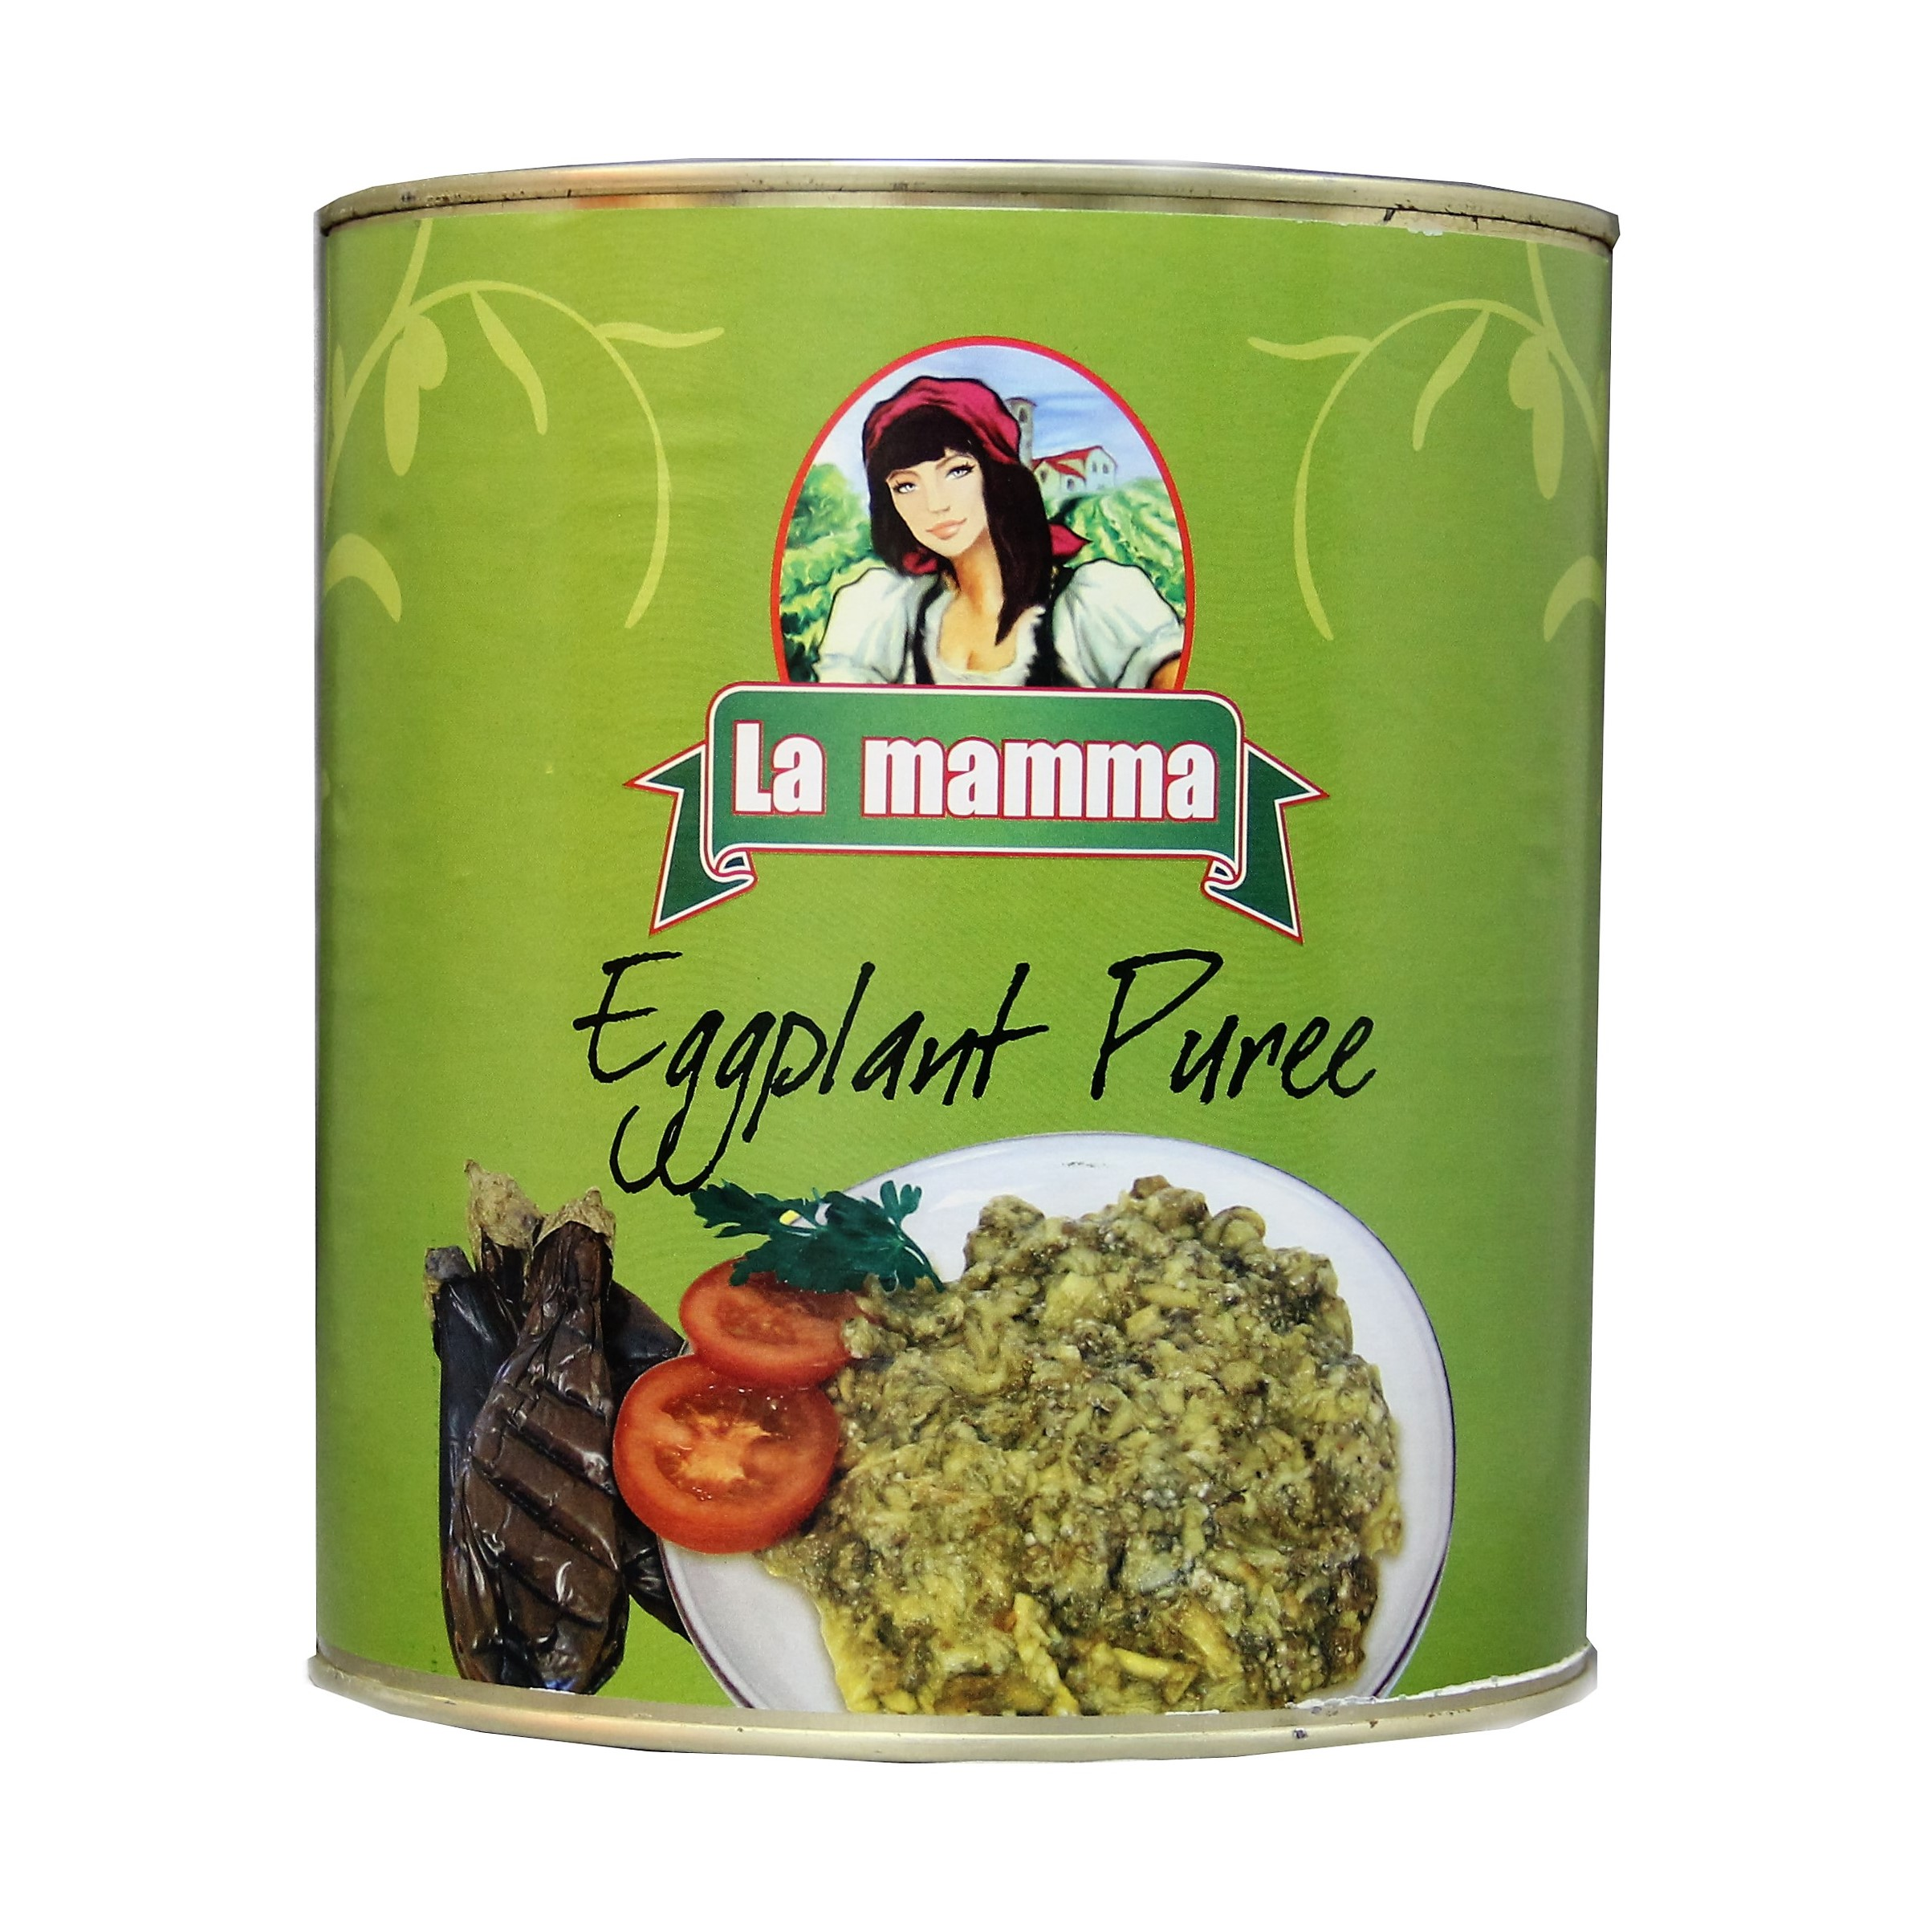 088 eggplant puree 3kg